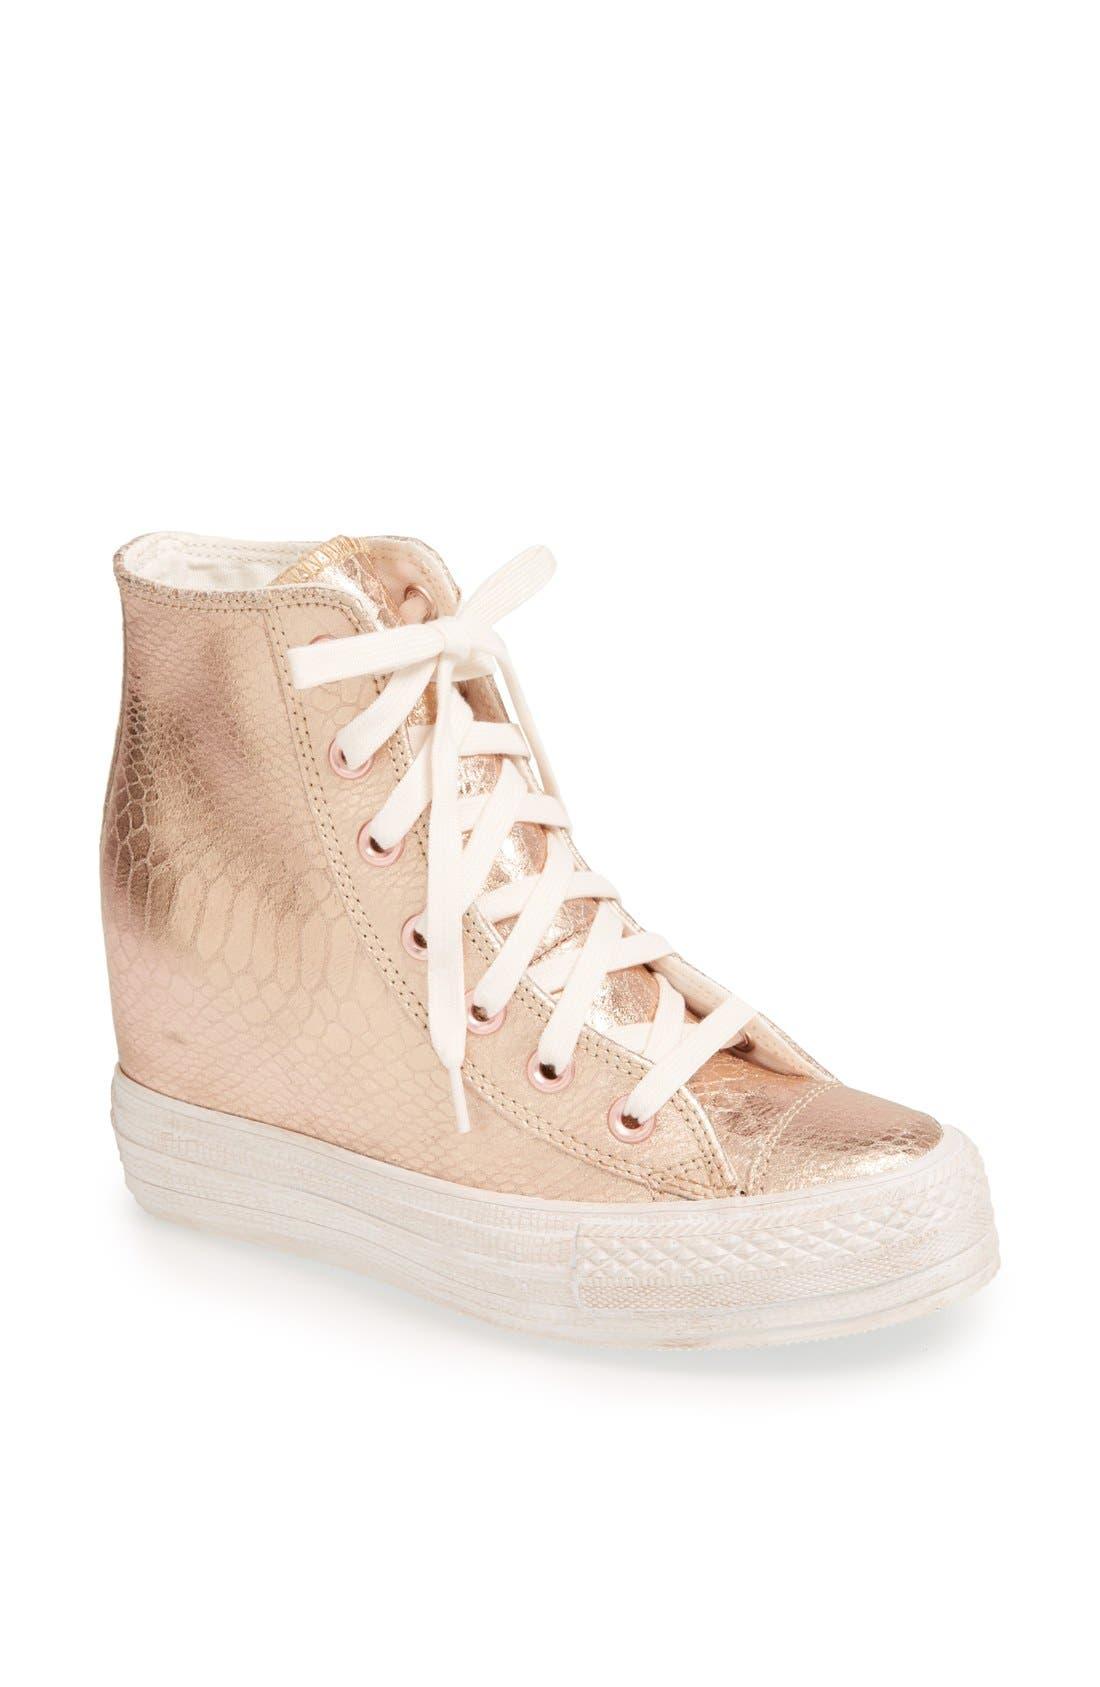 Main Image - Chuck Taylor® All Star® 'Platform Plus' Hidden Wedge Leather High-Top Sneaker (Women)